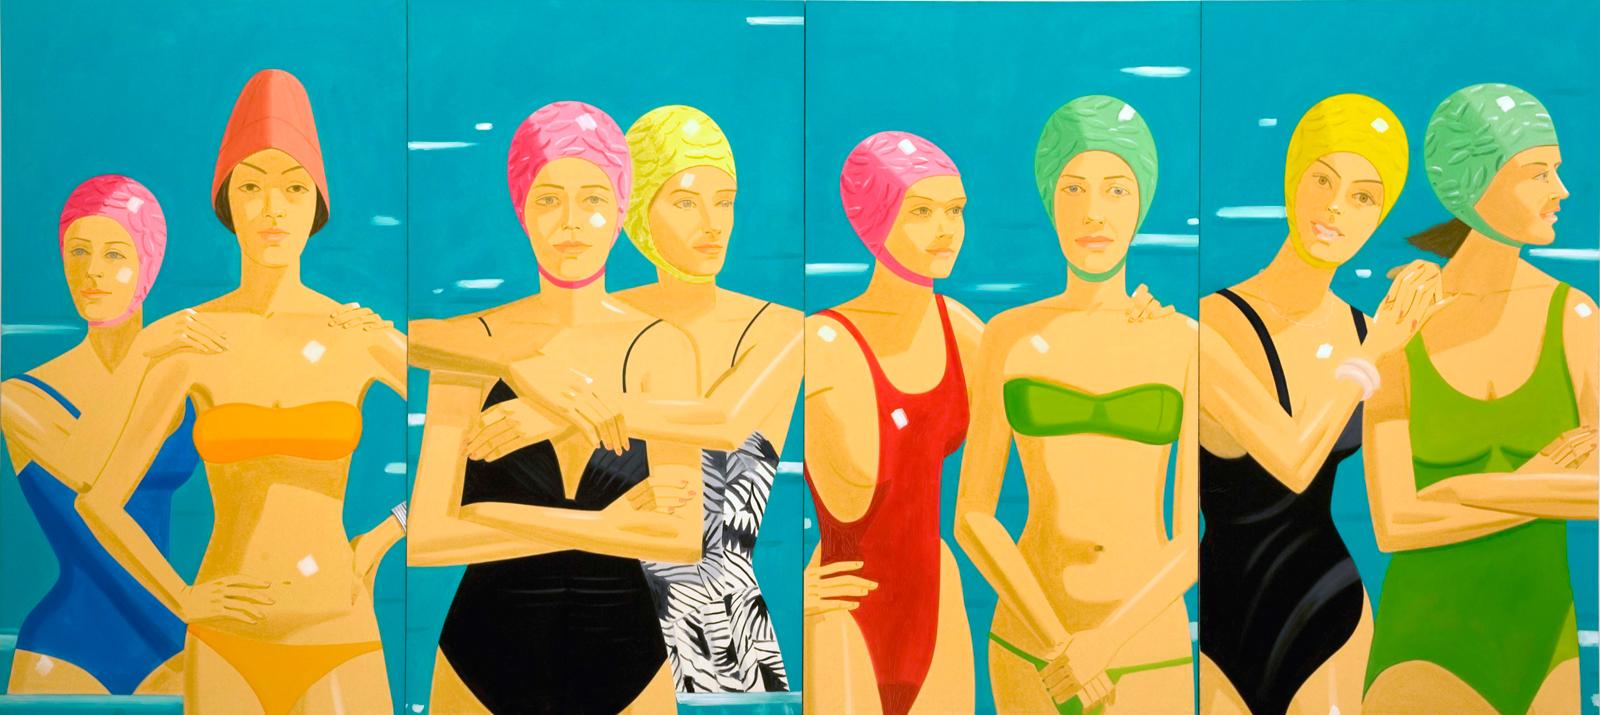 <i>Eleuthera</i>, 1984, Oil on linen, 305 x 670.5 cm, Private Collection, Courtesy Galería Javier López, Madrid, © Alex Katz/Licensed by VAGA, New York, NY.